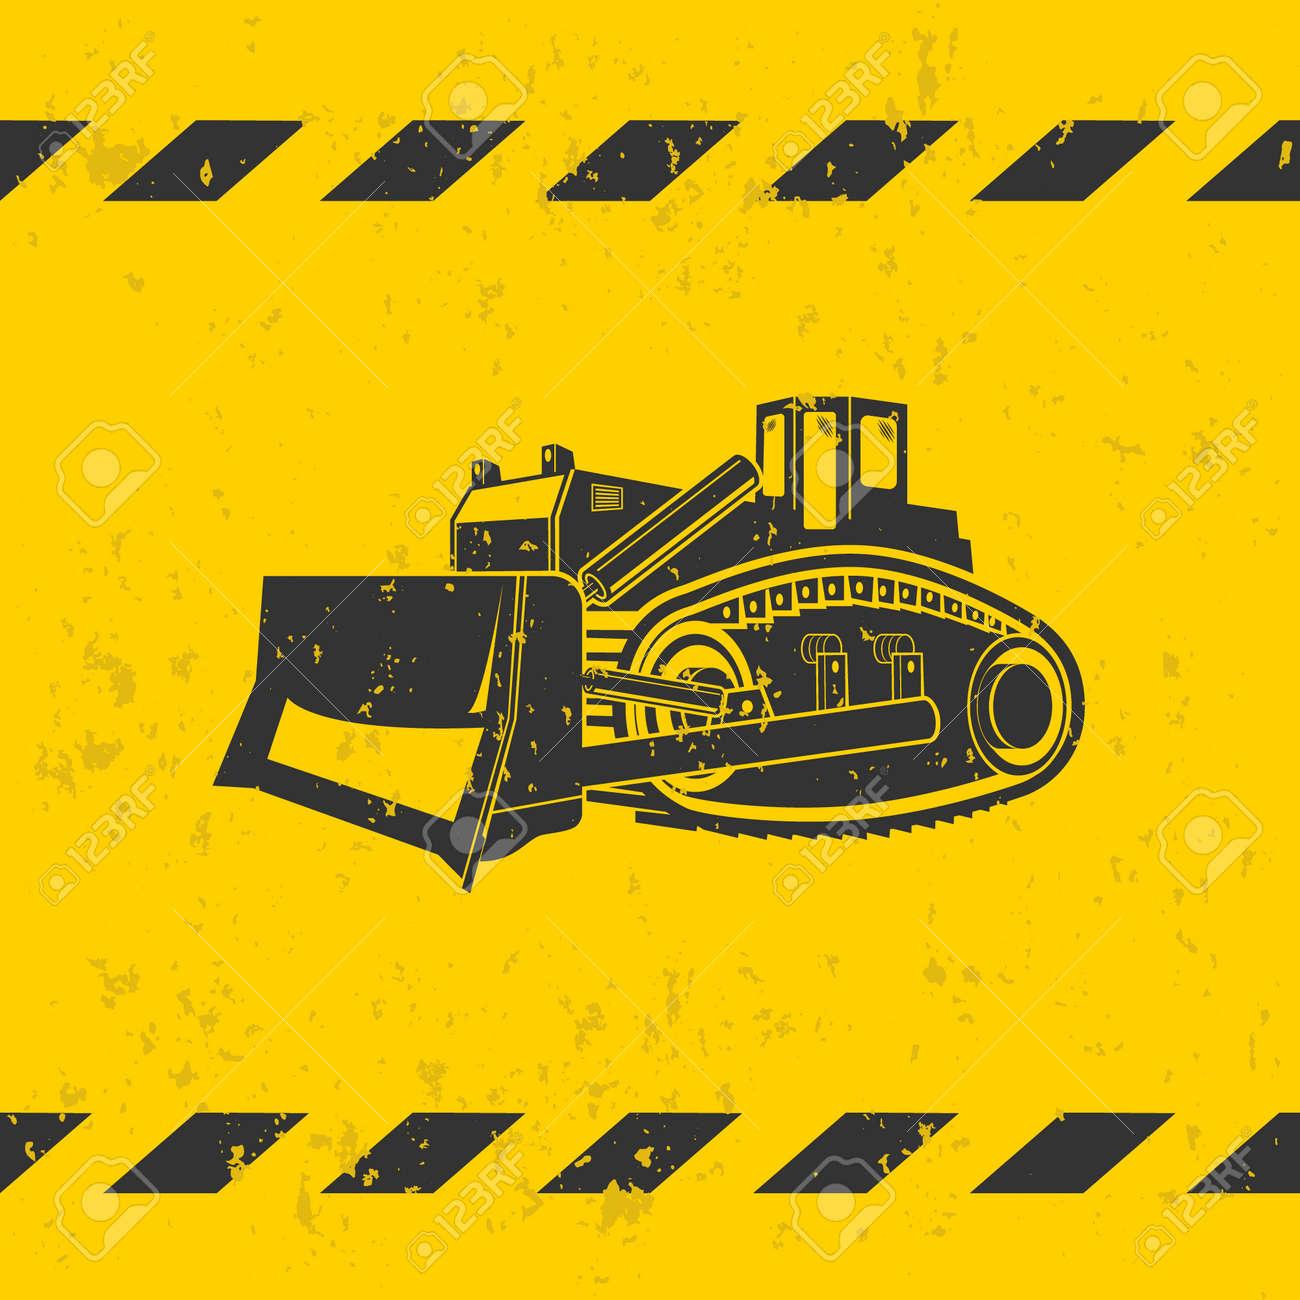 Bulldozer illustration on yellow background - grunge effect on separate layer - 42278438